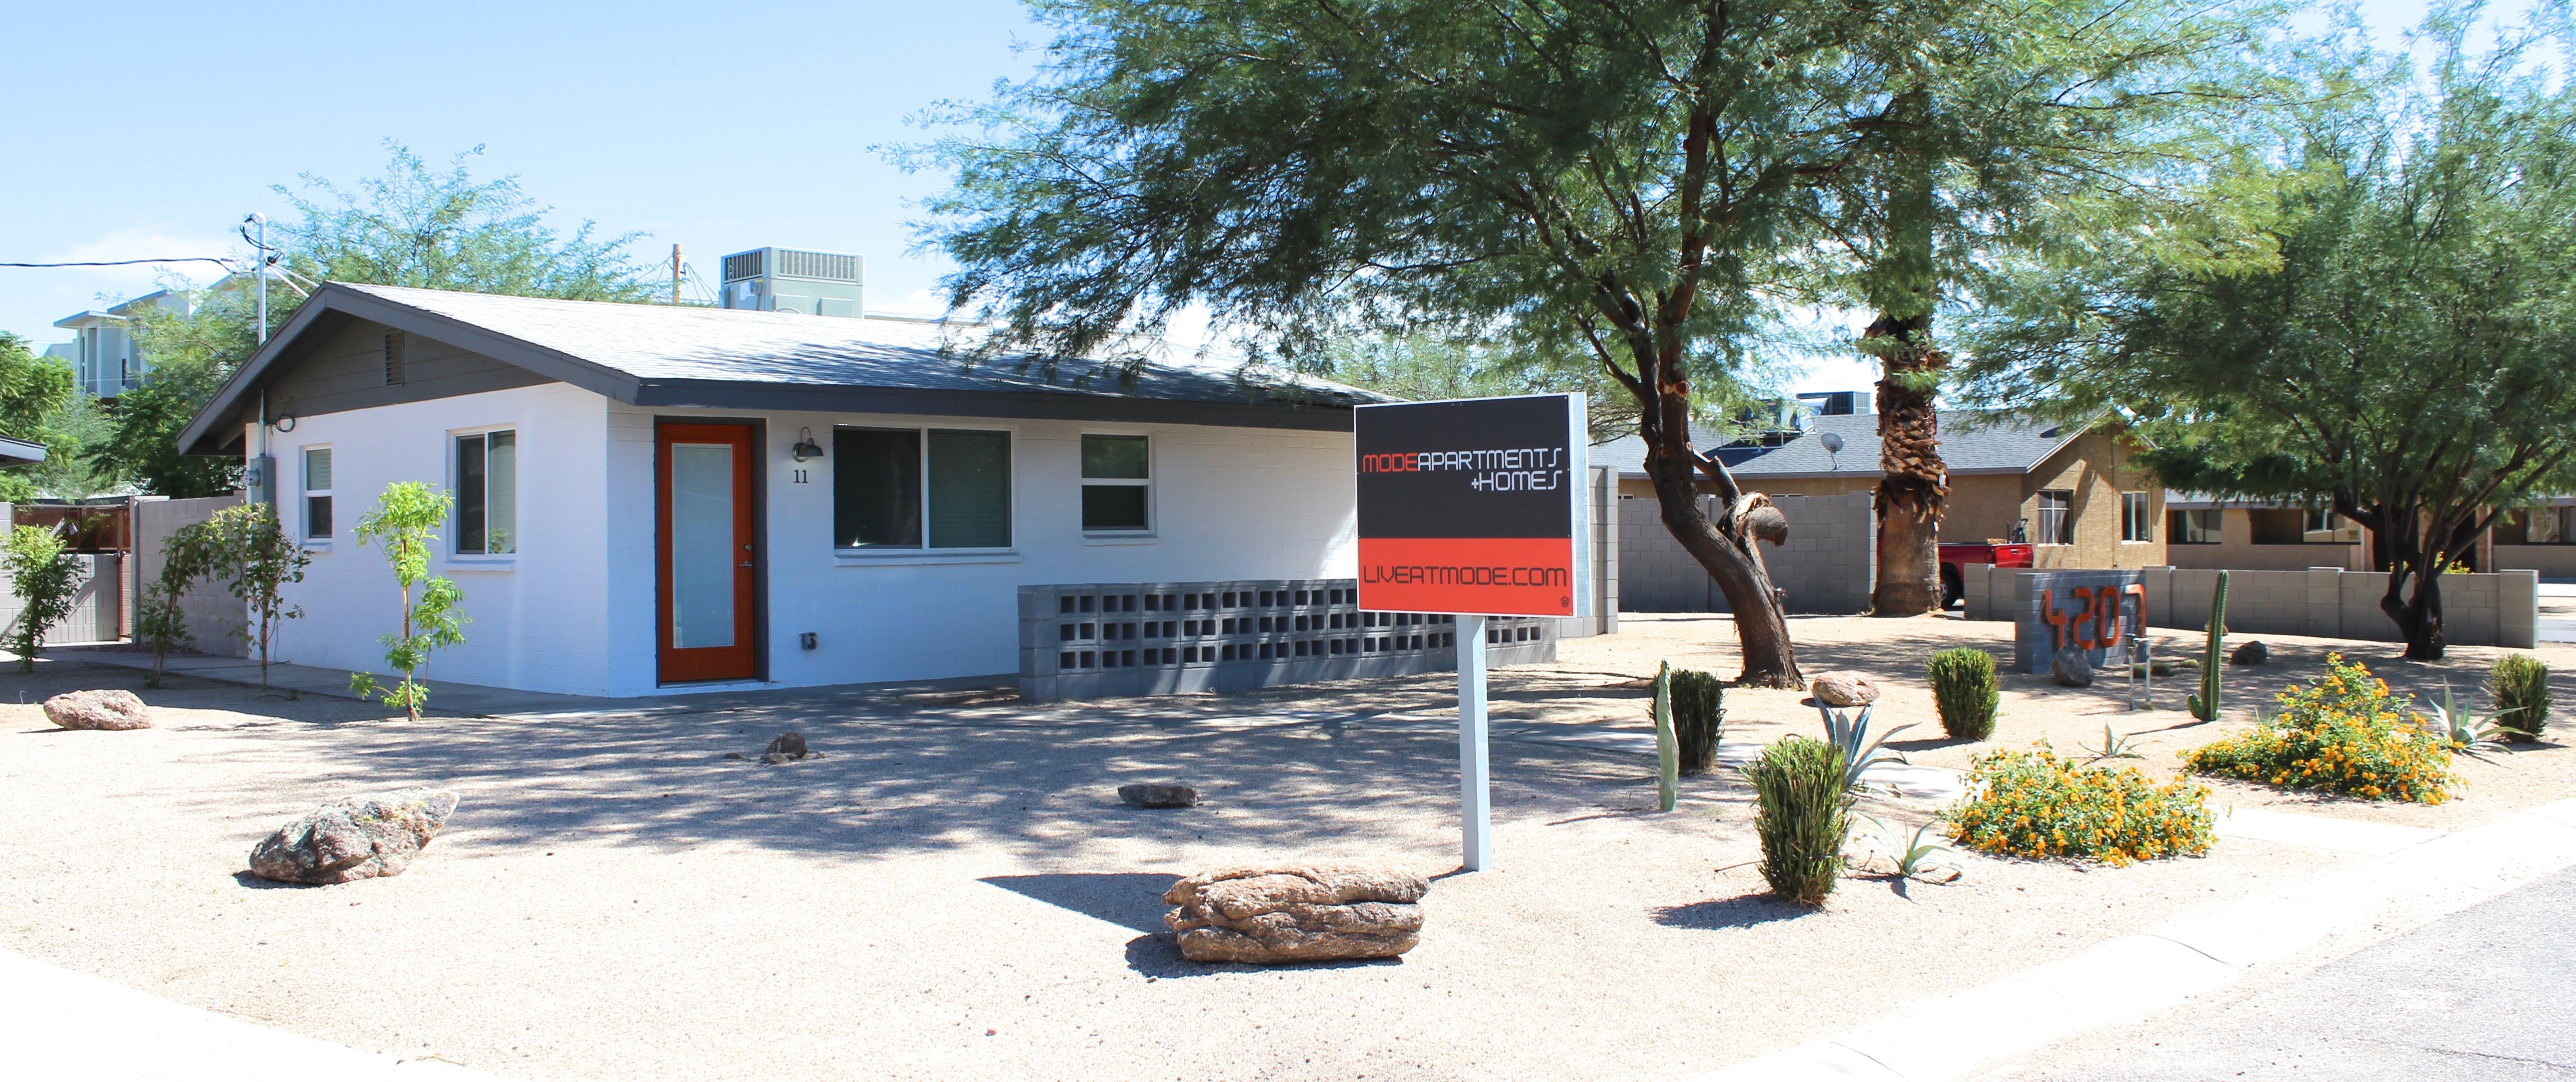 4207 N 27th Street, Phoenix, AZ 85016   Biltmore Phoenix Apartments